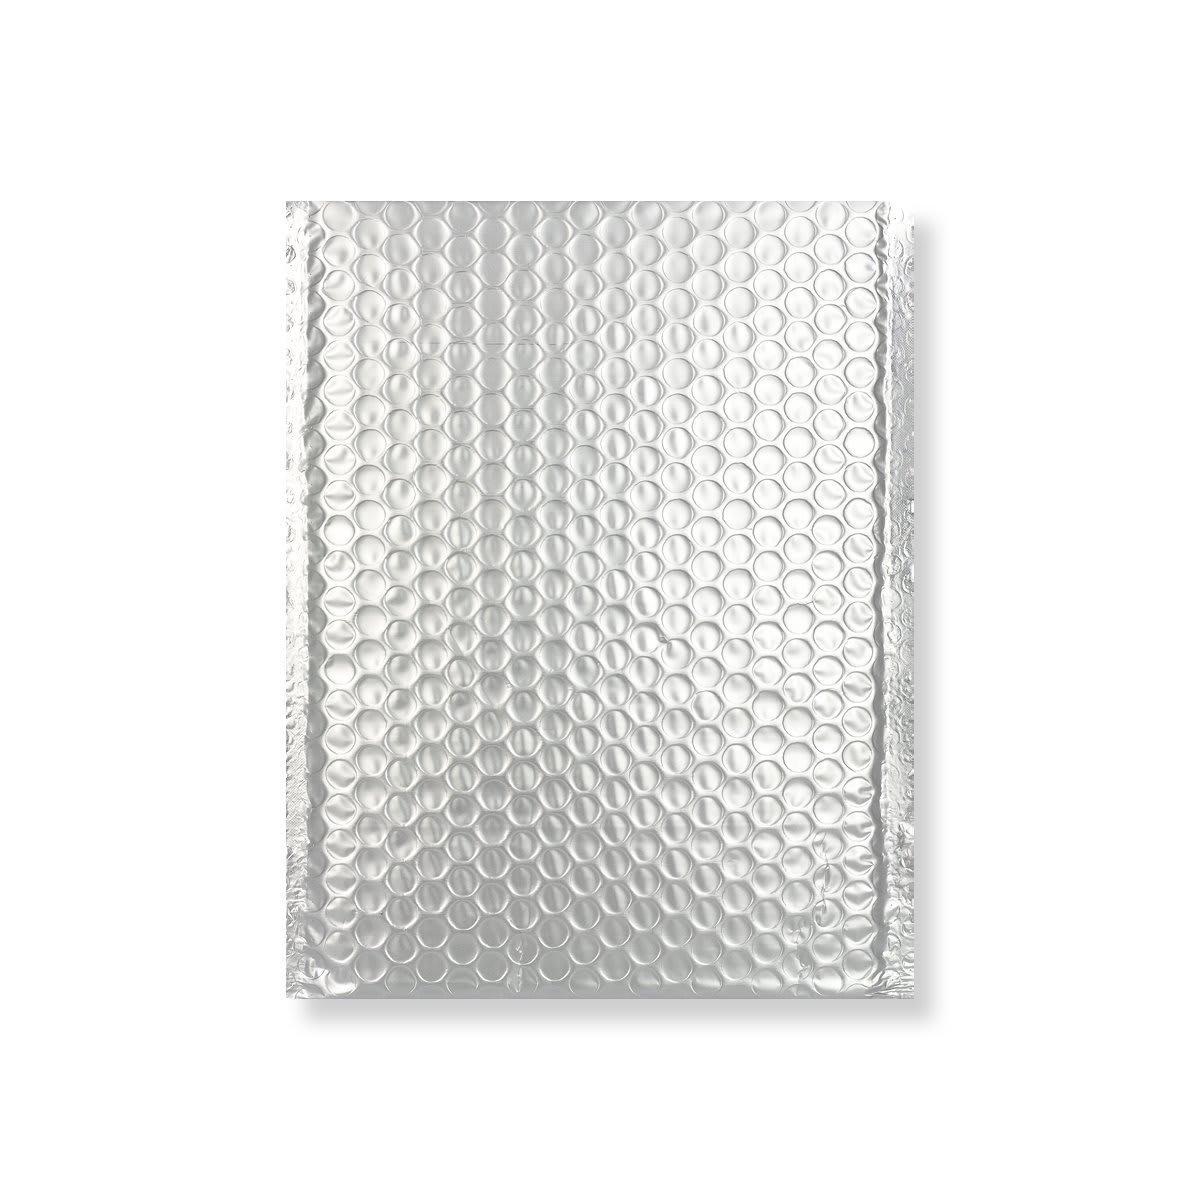 C5 + MATT METALLIC SILVER PADDED ENVELOPES (250 x 180MM)